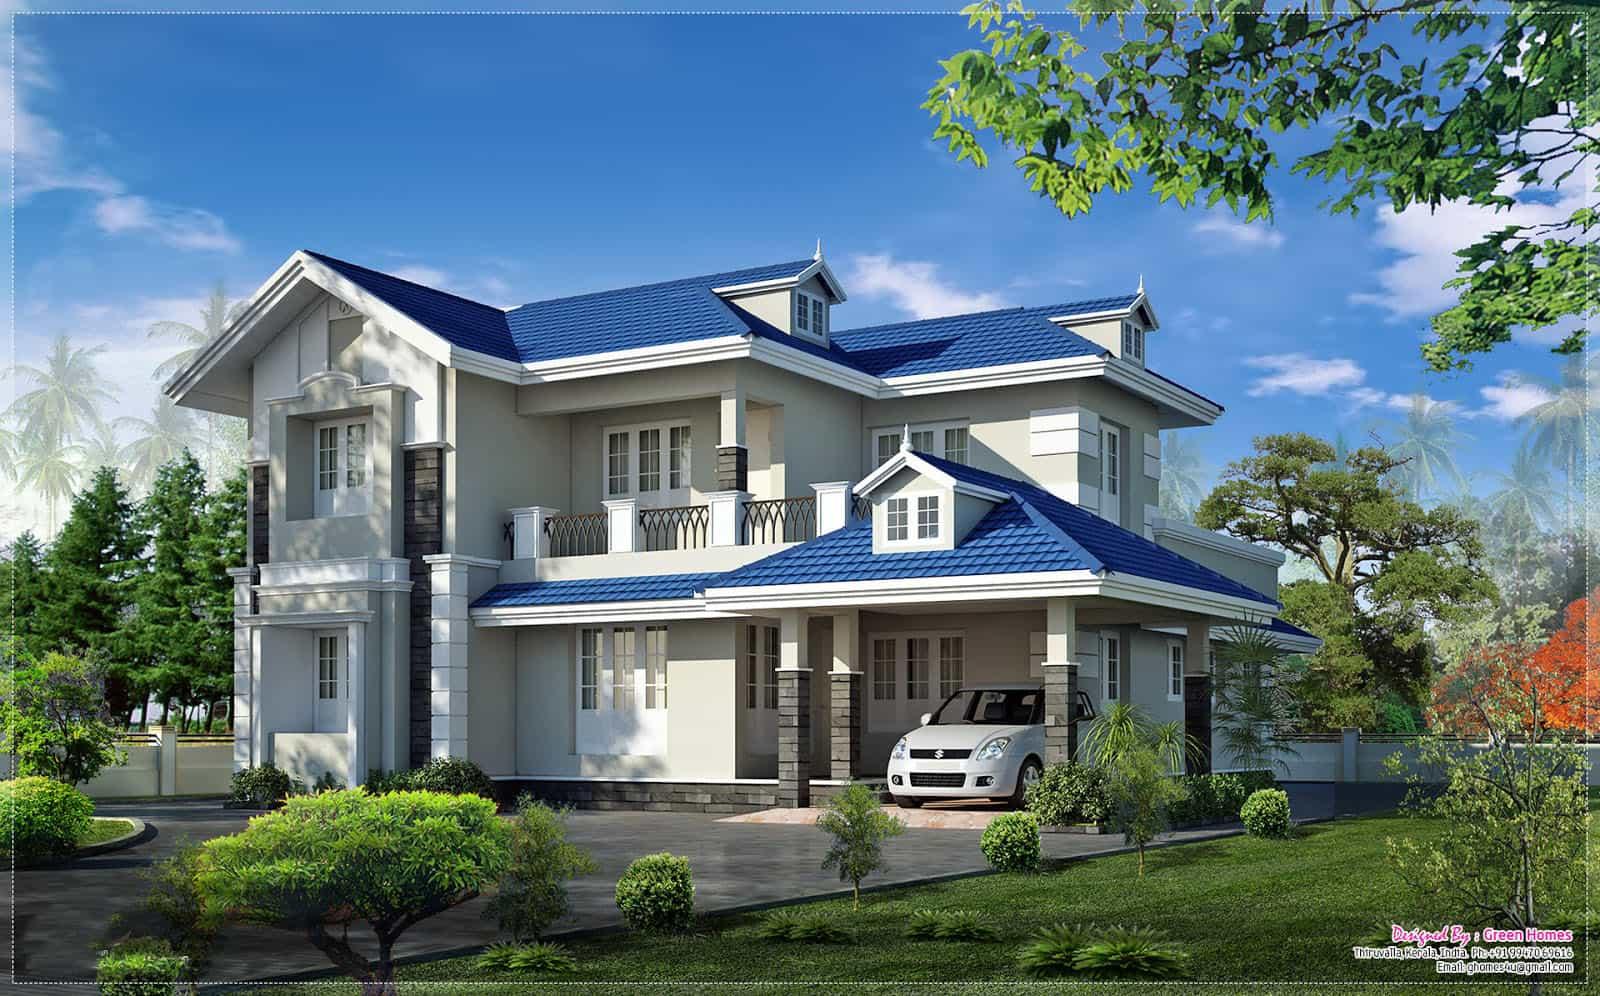 Small House Plans in Kerala - 3 Bedroom - KeralaHousePlanner